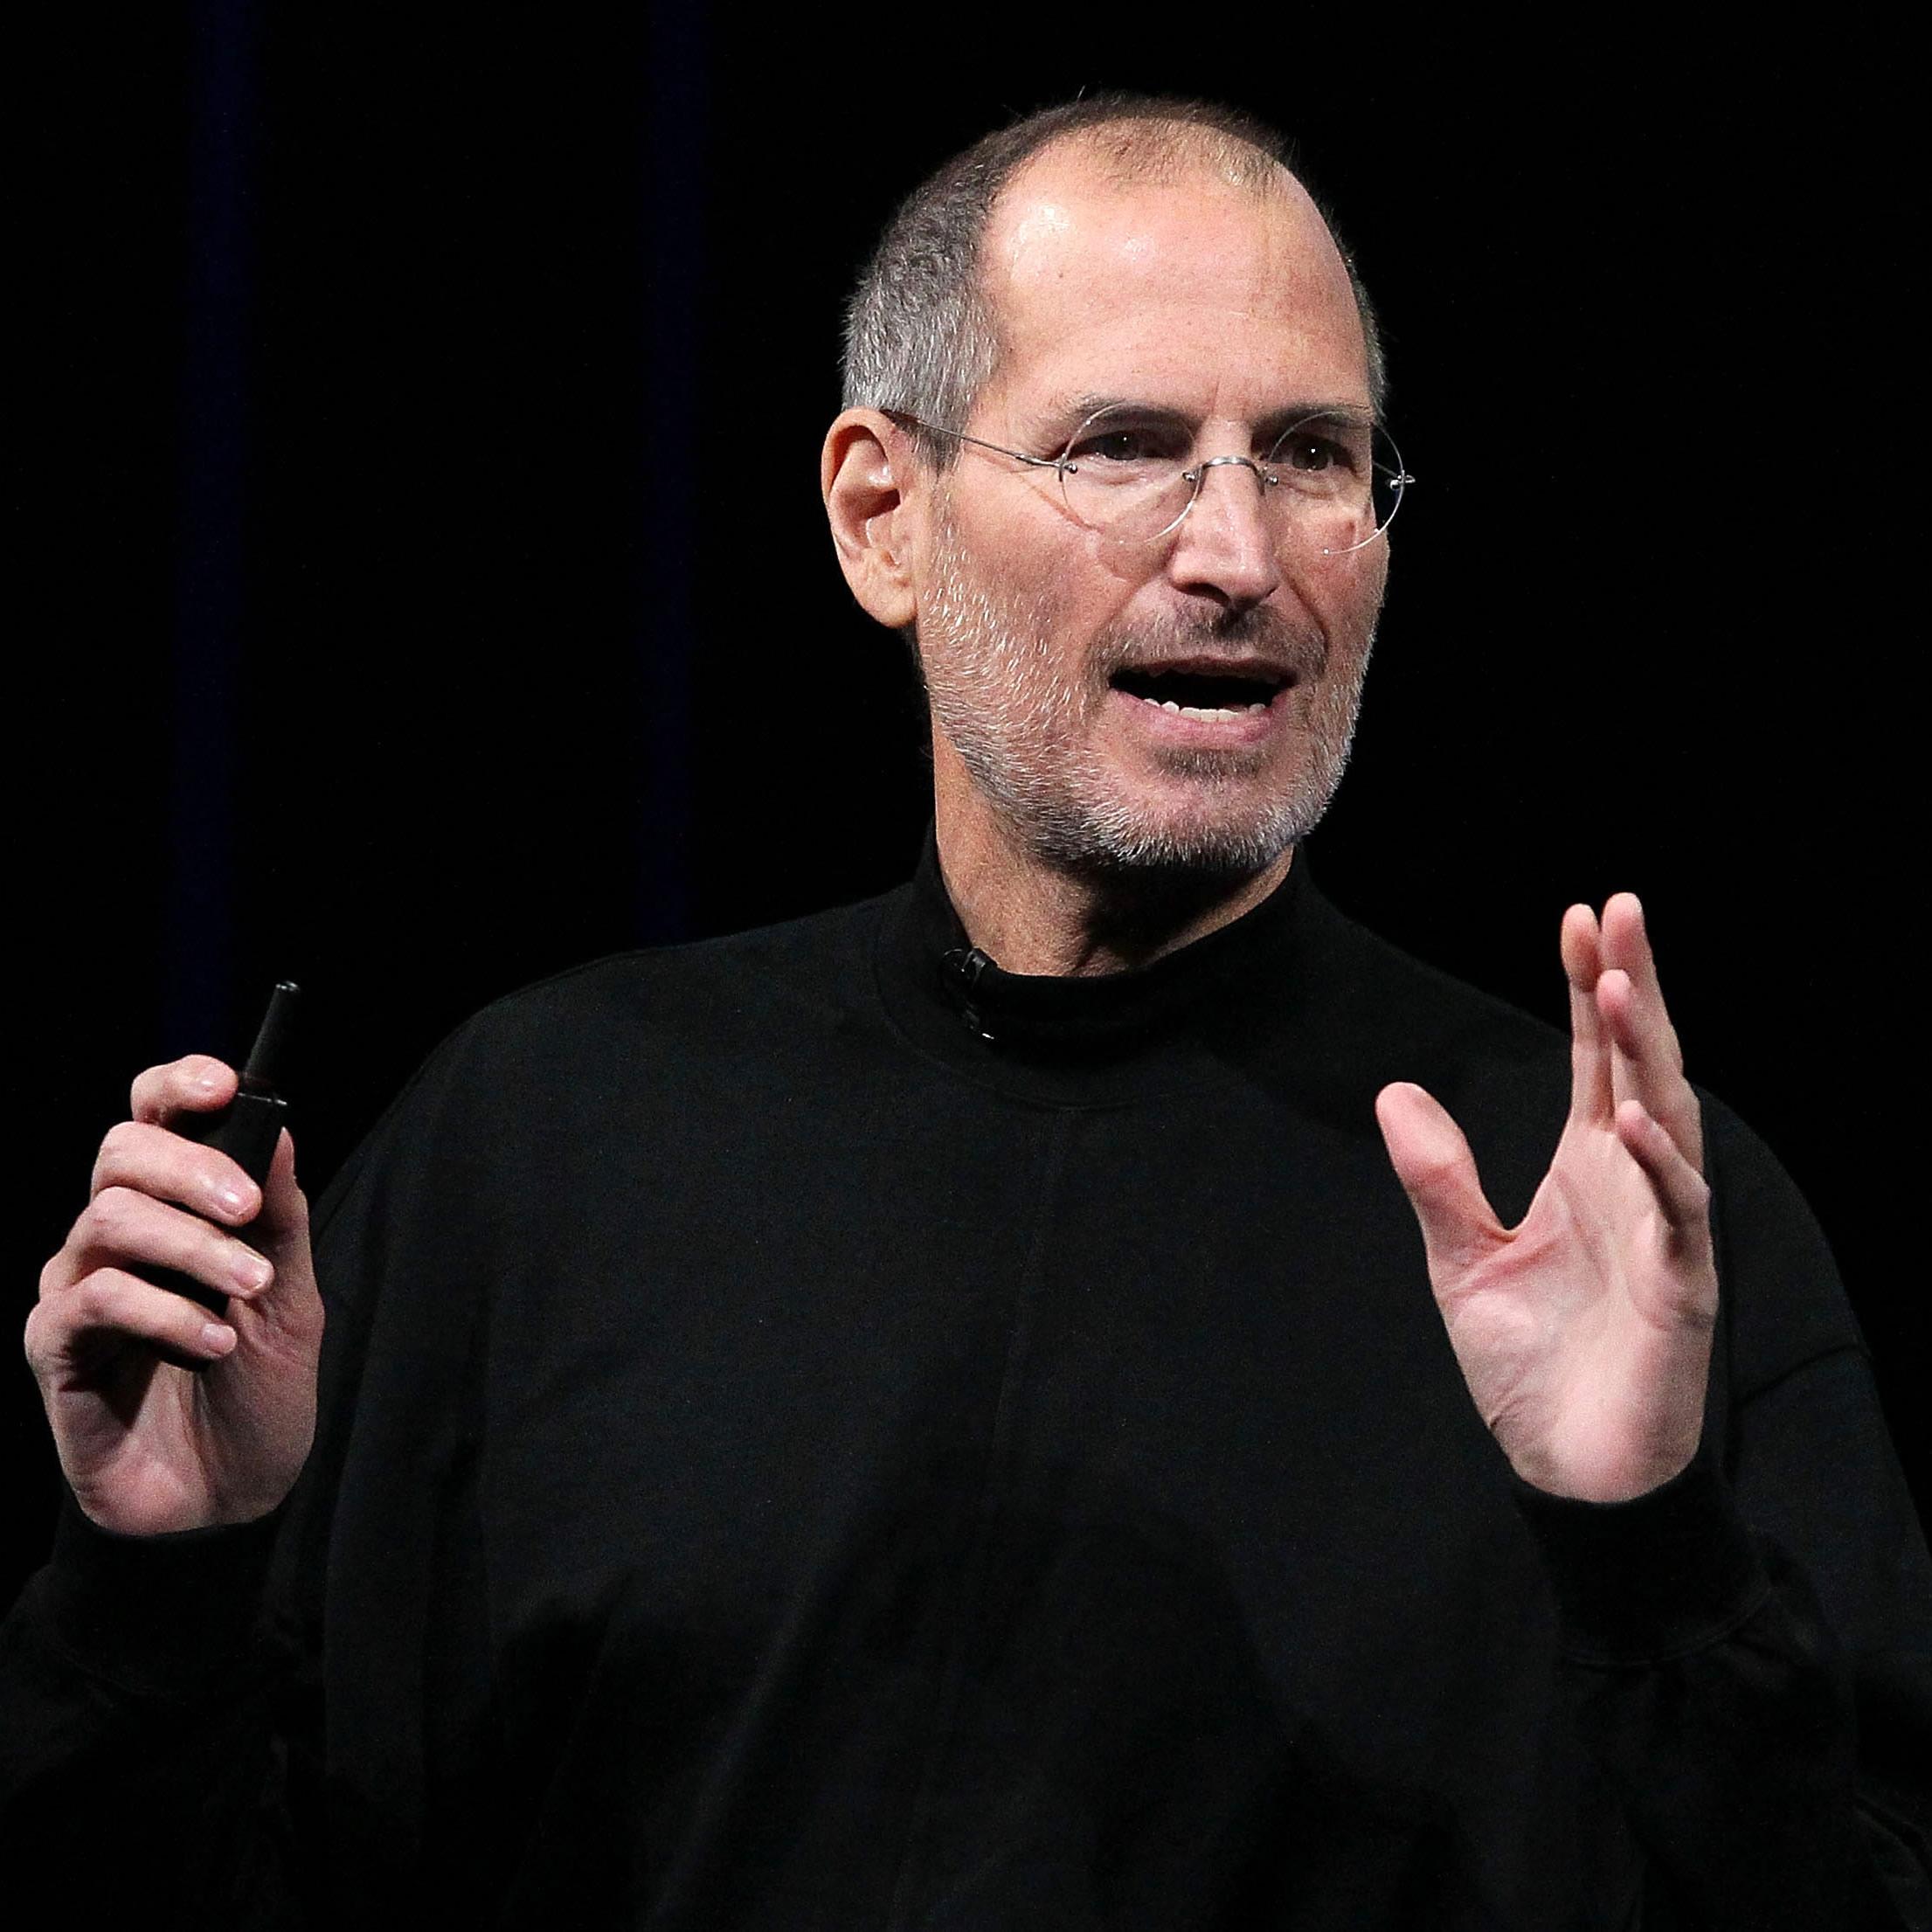 Steve Jobs Presentations